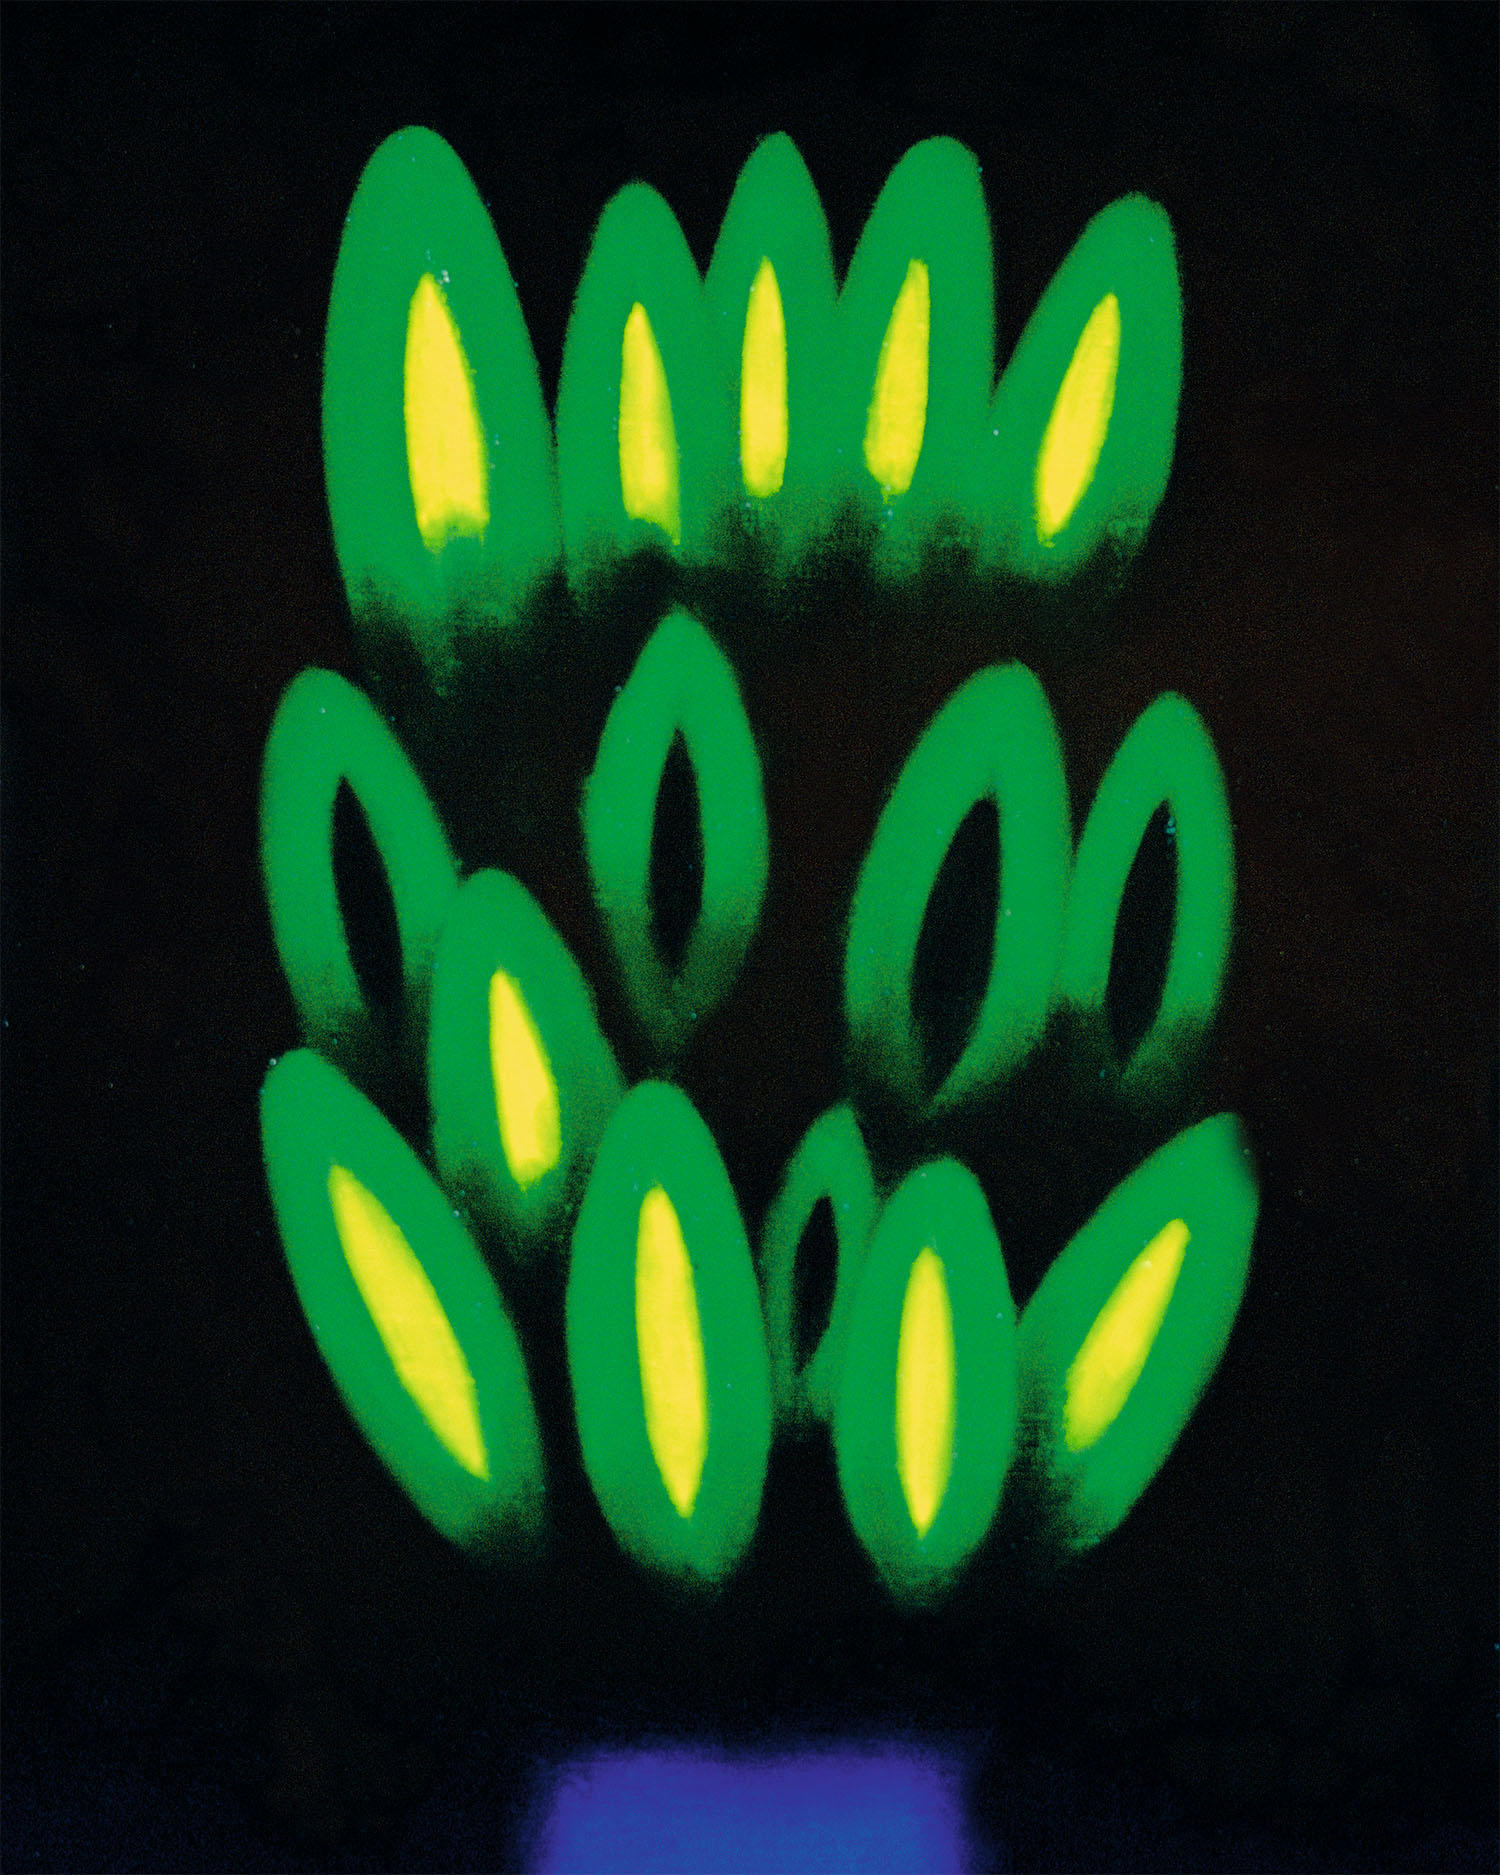 Cactus. Josep Navarro Vives. 1999, Oli sobre tela, cm 46 x 33.